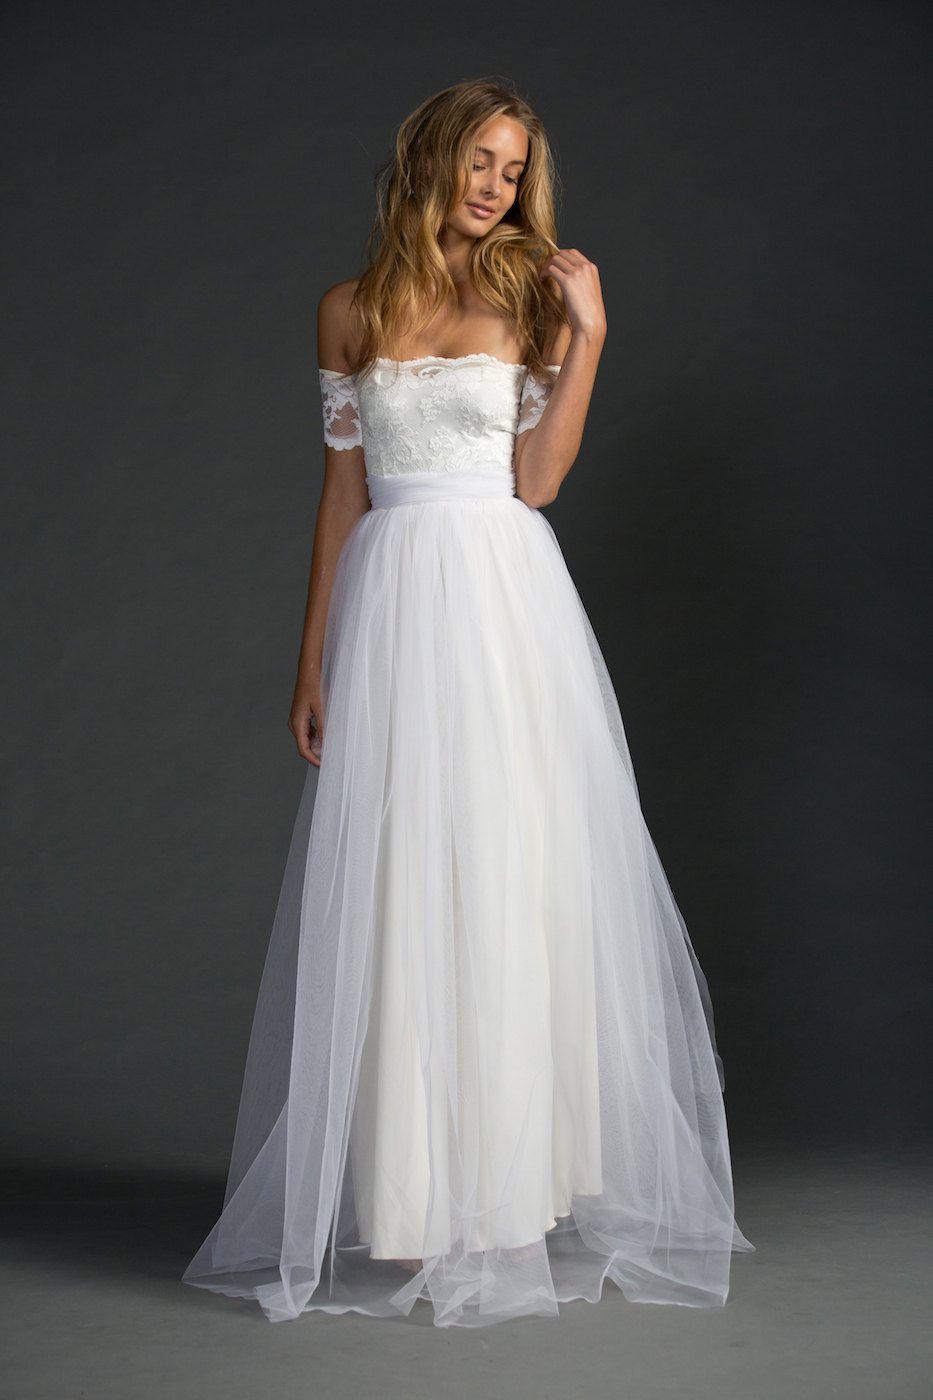 Beautiful wedding dresses for beach weddings beach weddings and